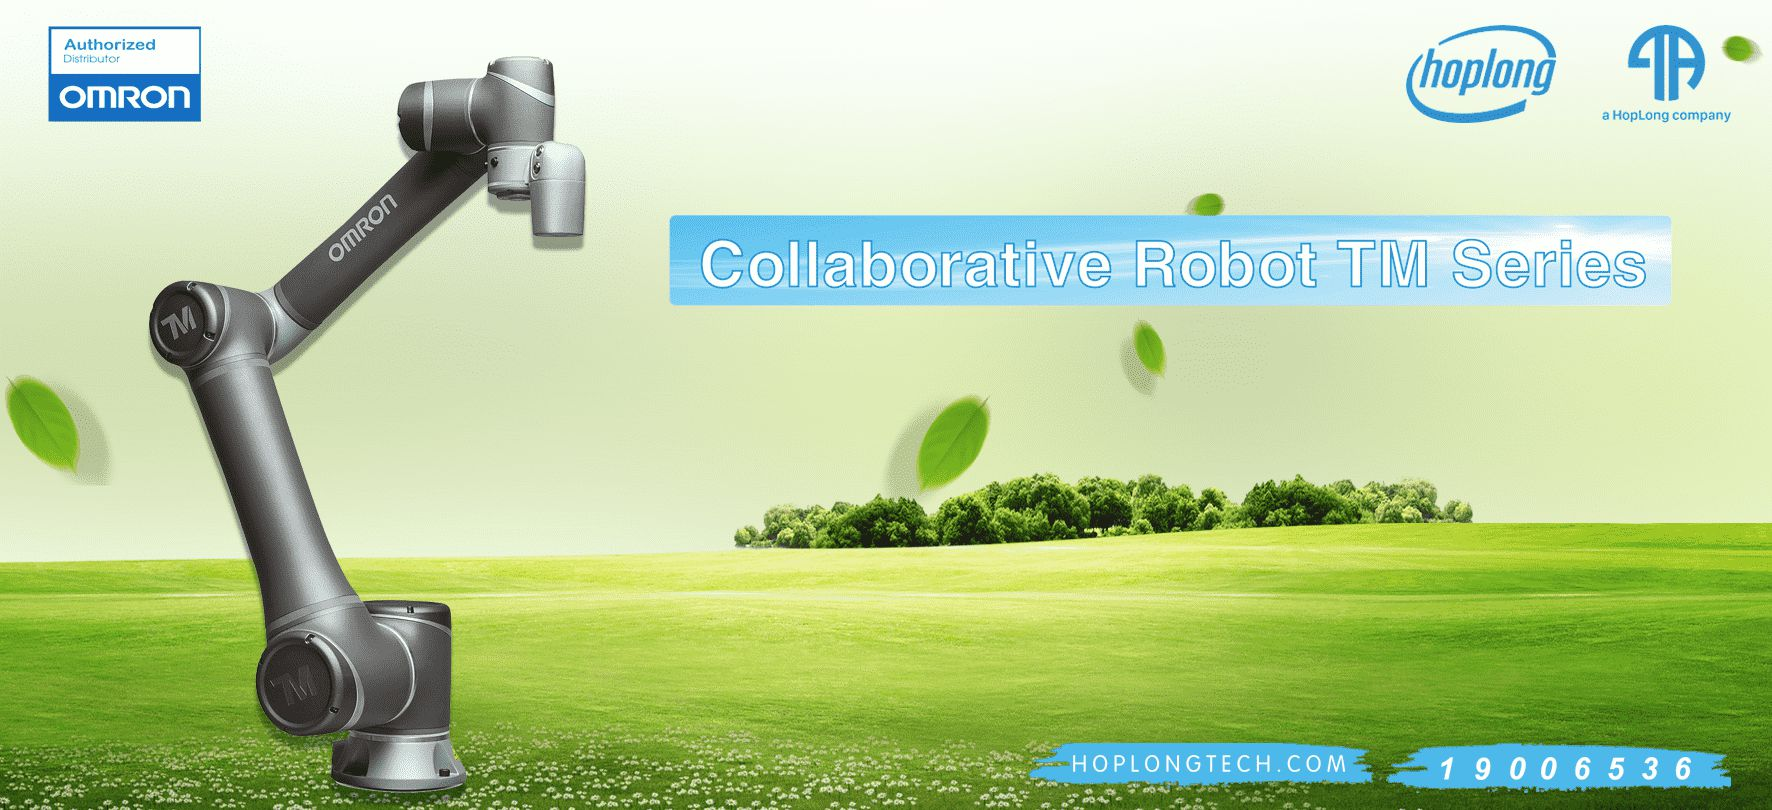 [ OMRON- Giới Thiệu ] Collaborative Robot TM Series